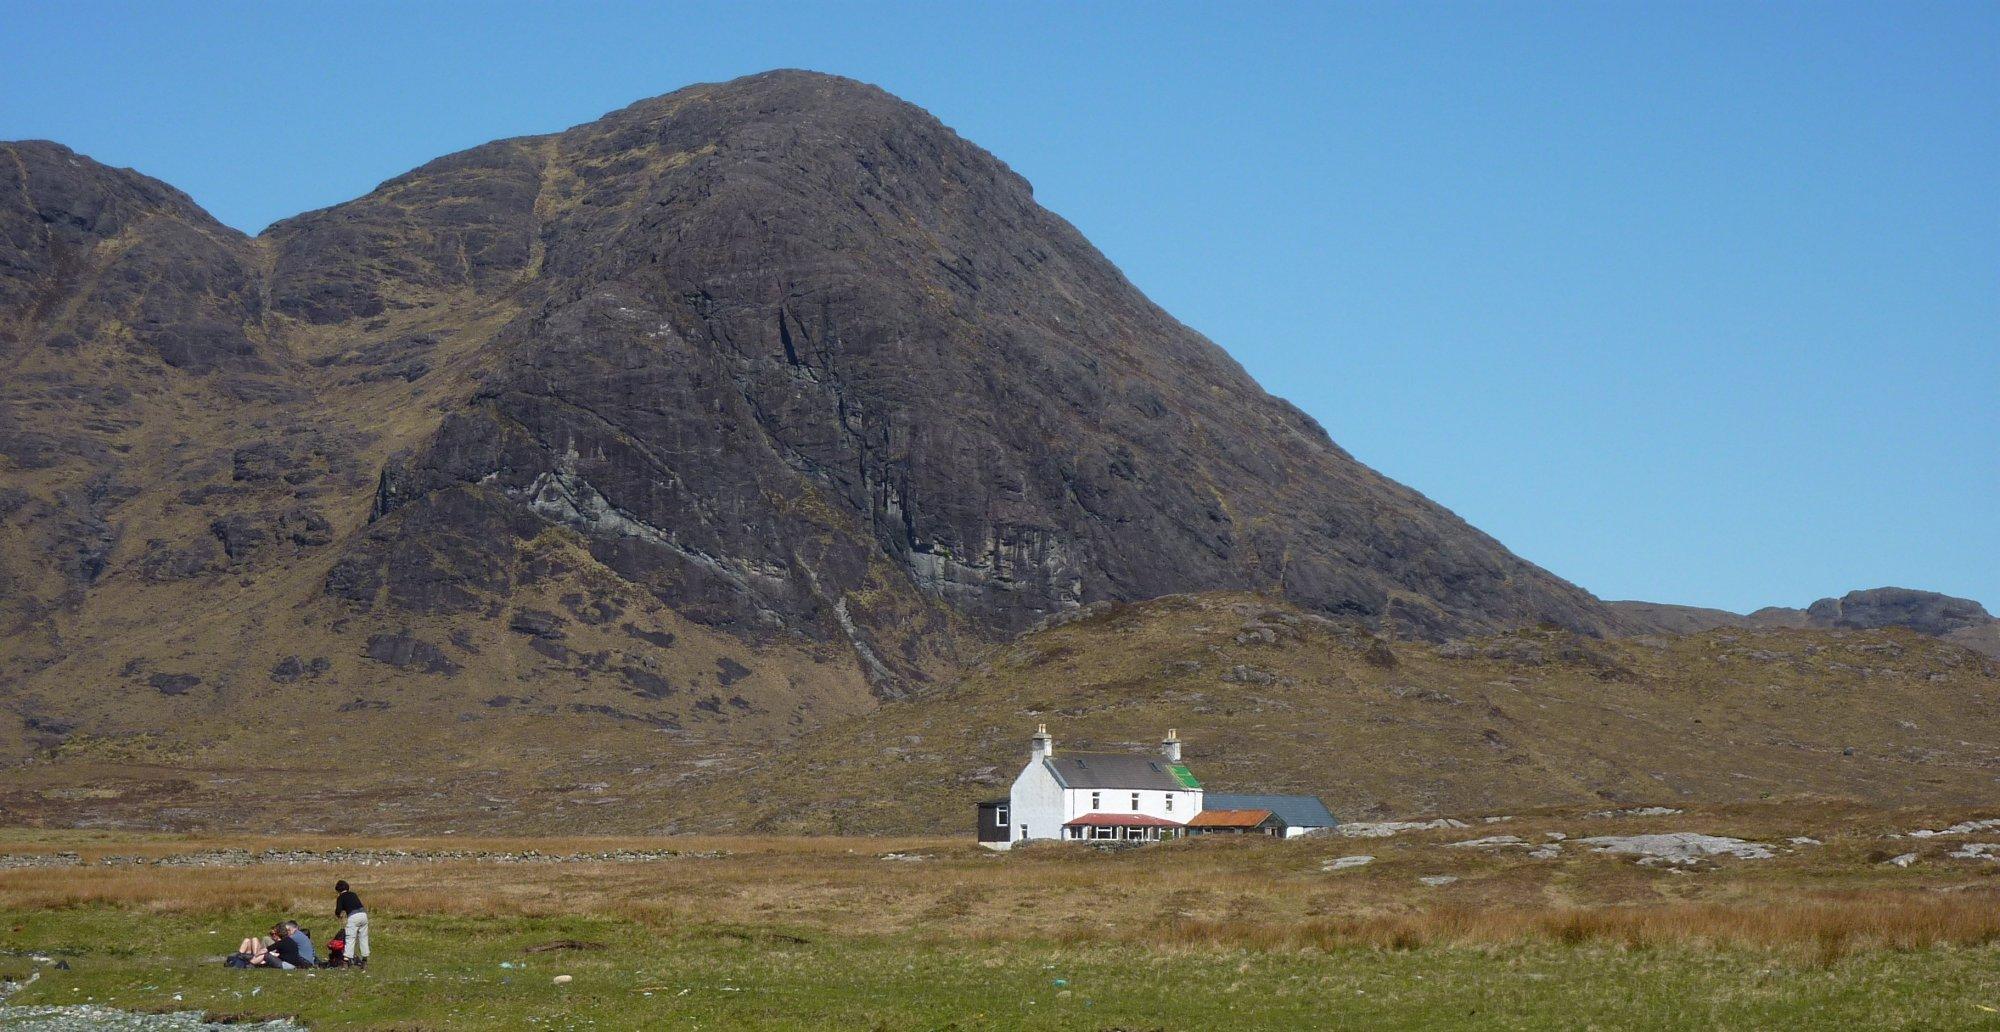 The house at Camasunary